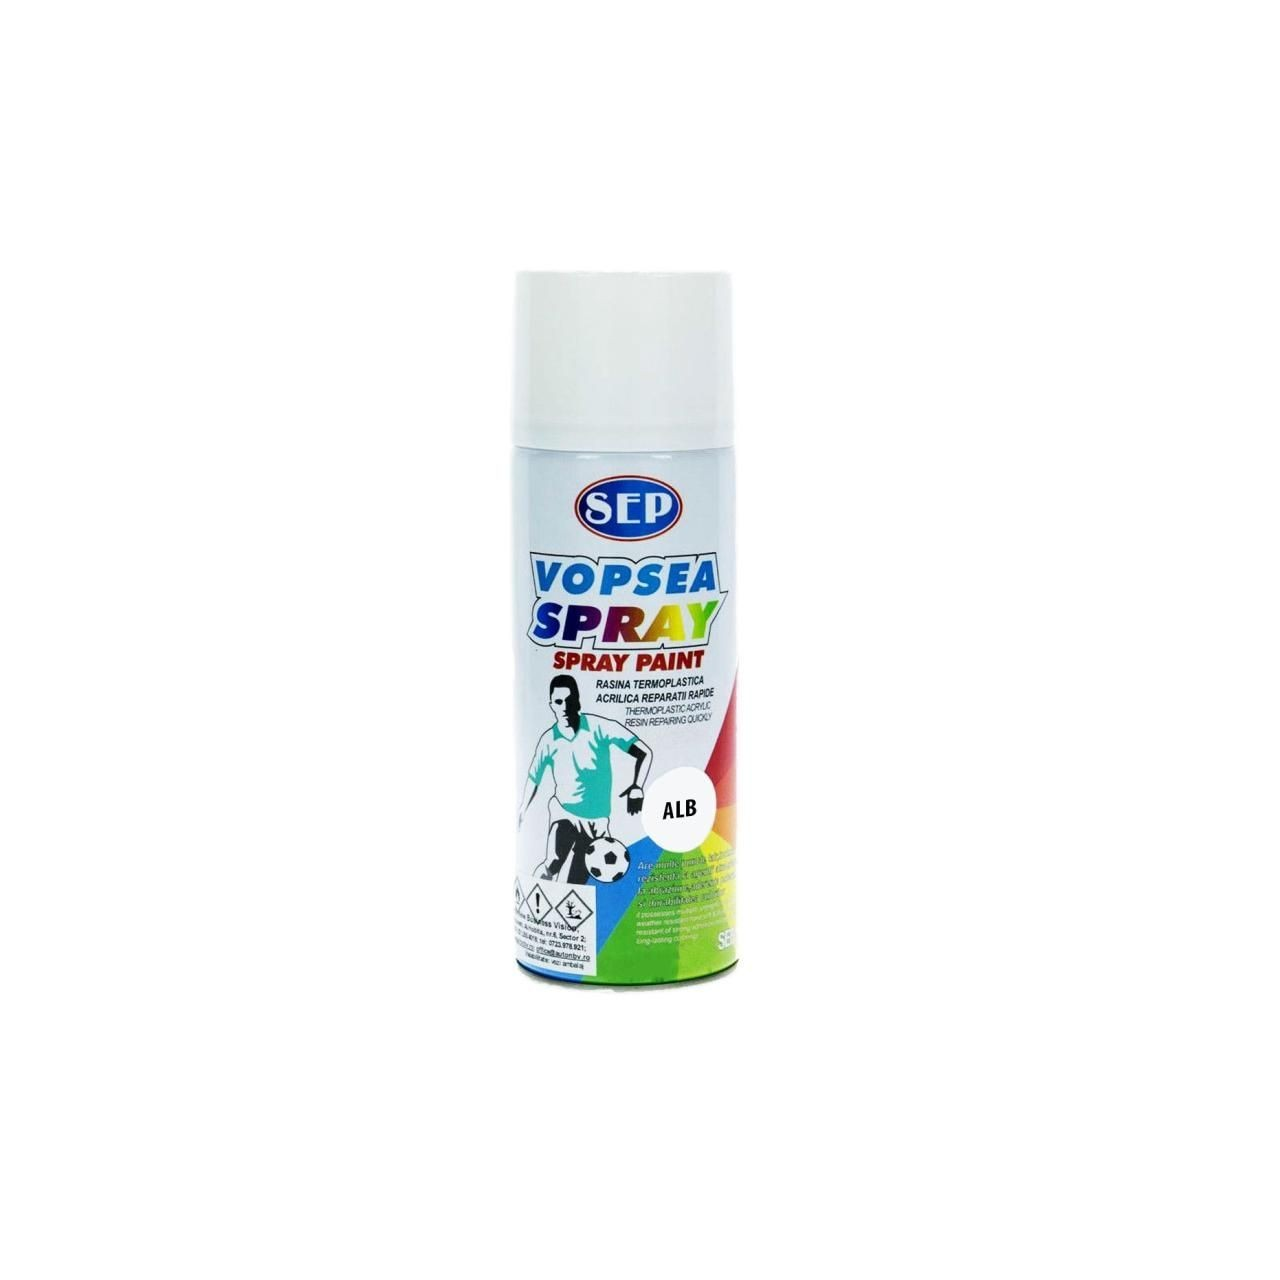 SEP Spray vopsea lemn si metal, Alb 10, 400 ml + CADOU imagine techstar.ro 2021